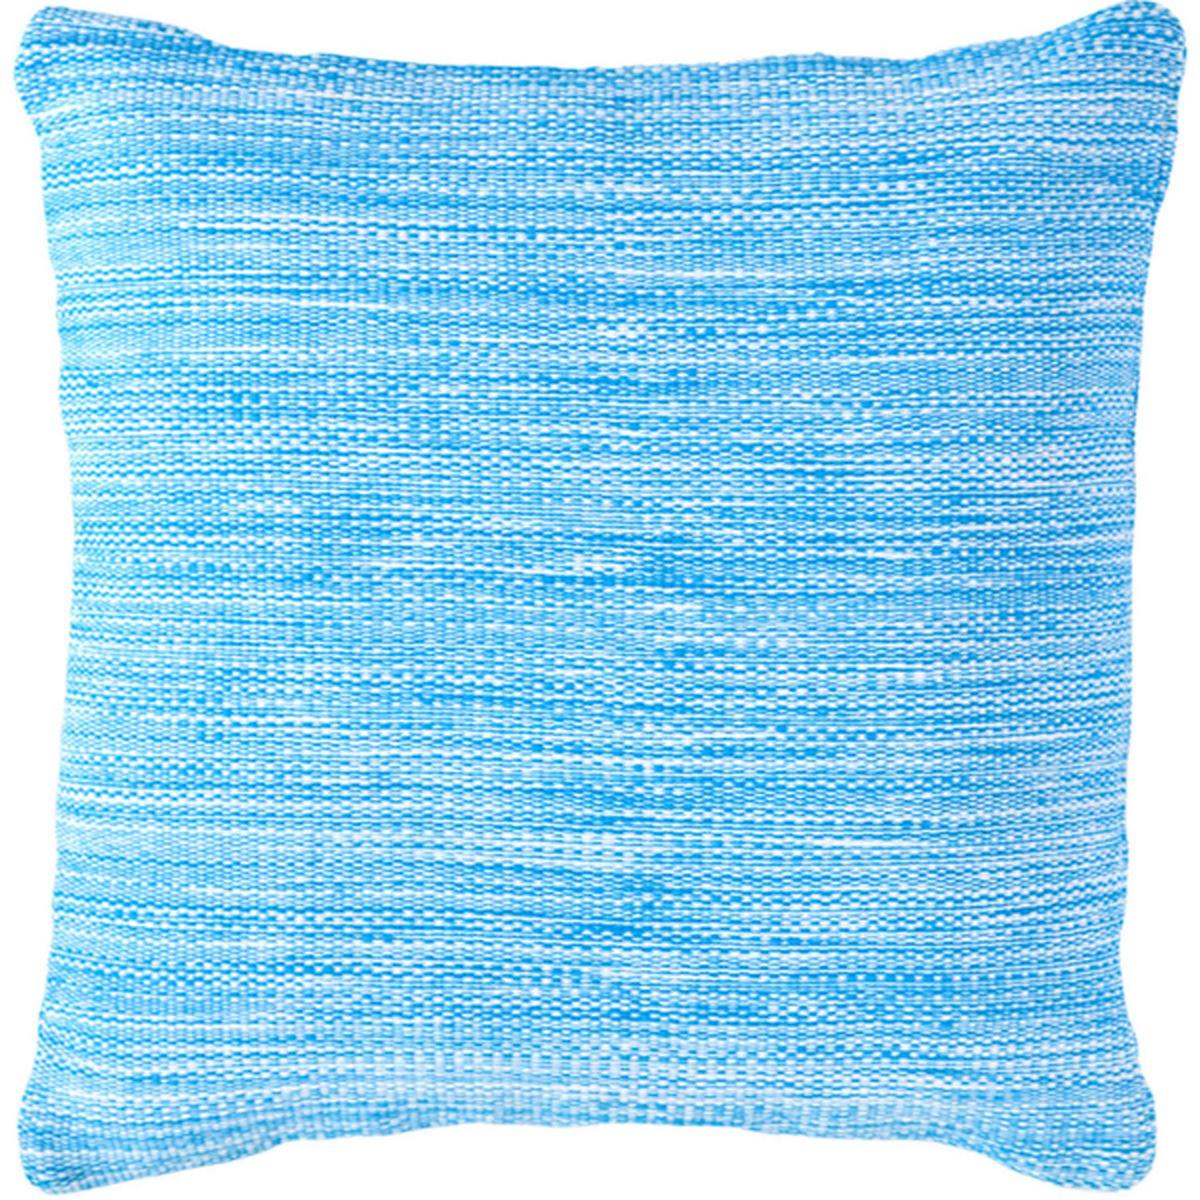 Fresh American Mingled Turquoise Indoor/Outdoor Pillow